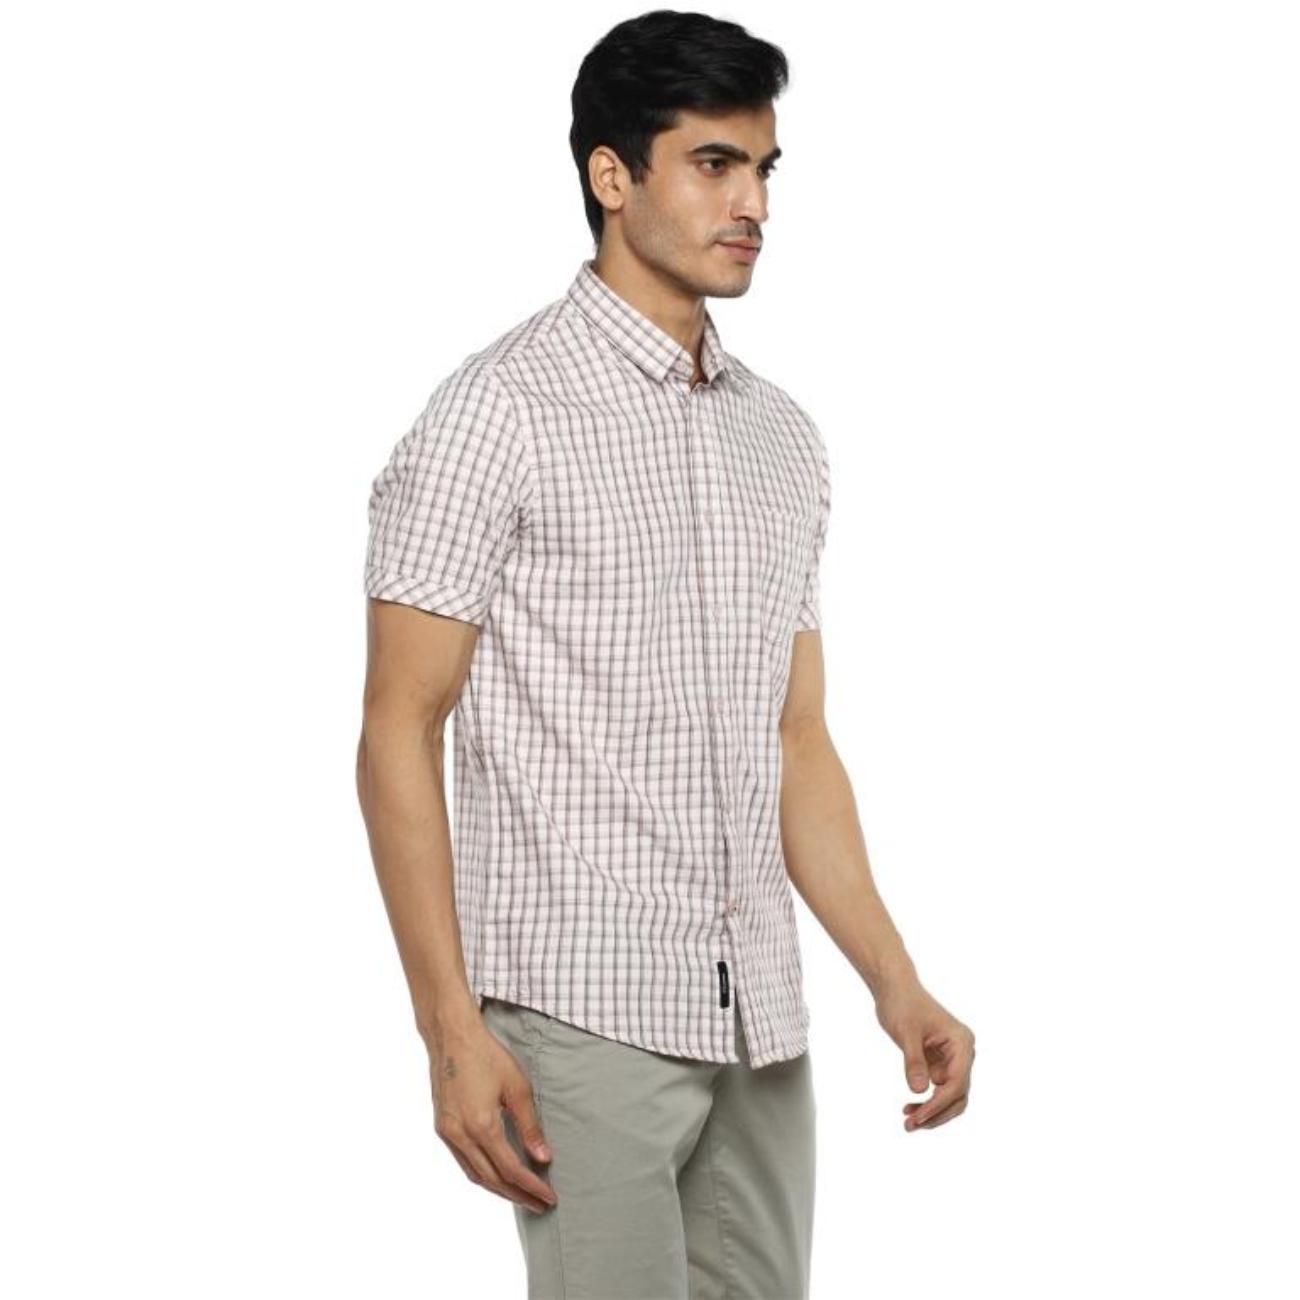 Collar Neck Shirts